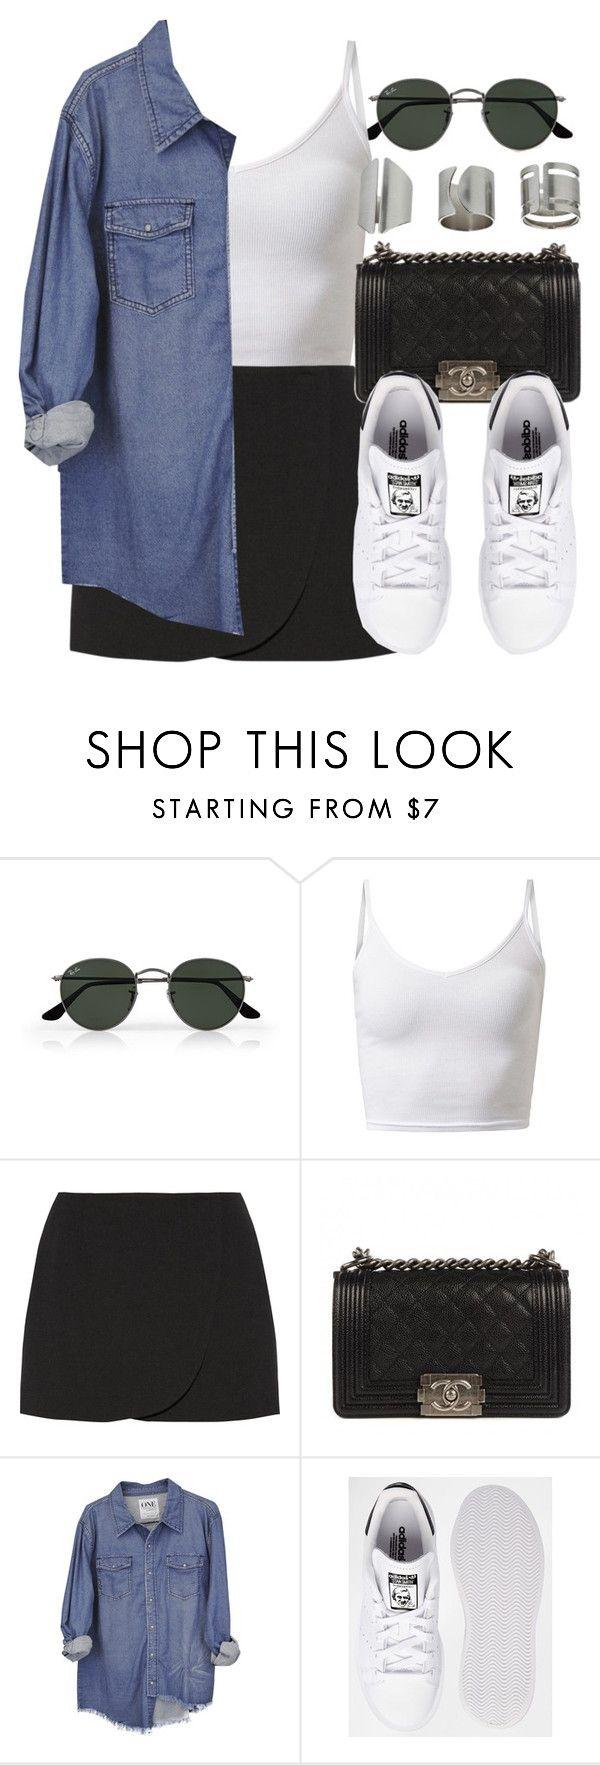 """Style #11045"" by vany-alvarado ❤ liked on Polyvore featuring Ray-Ban, Jill Stuart, Chanel, adidas and Topshop"